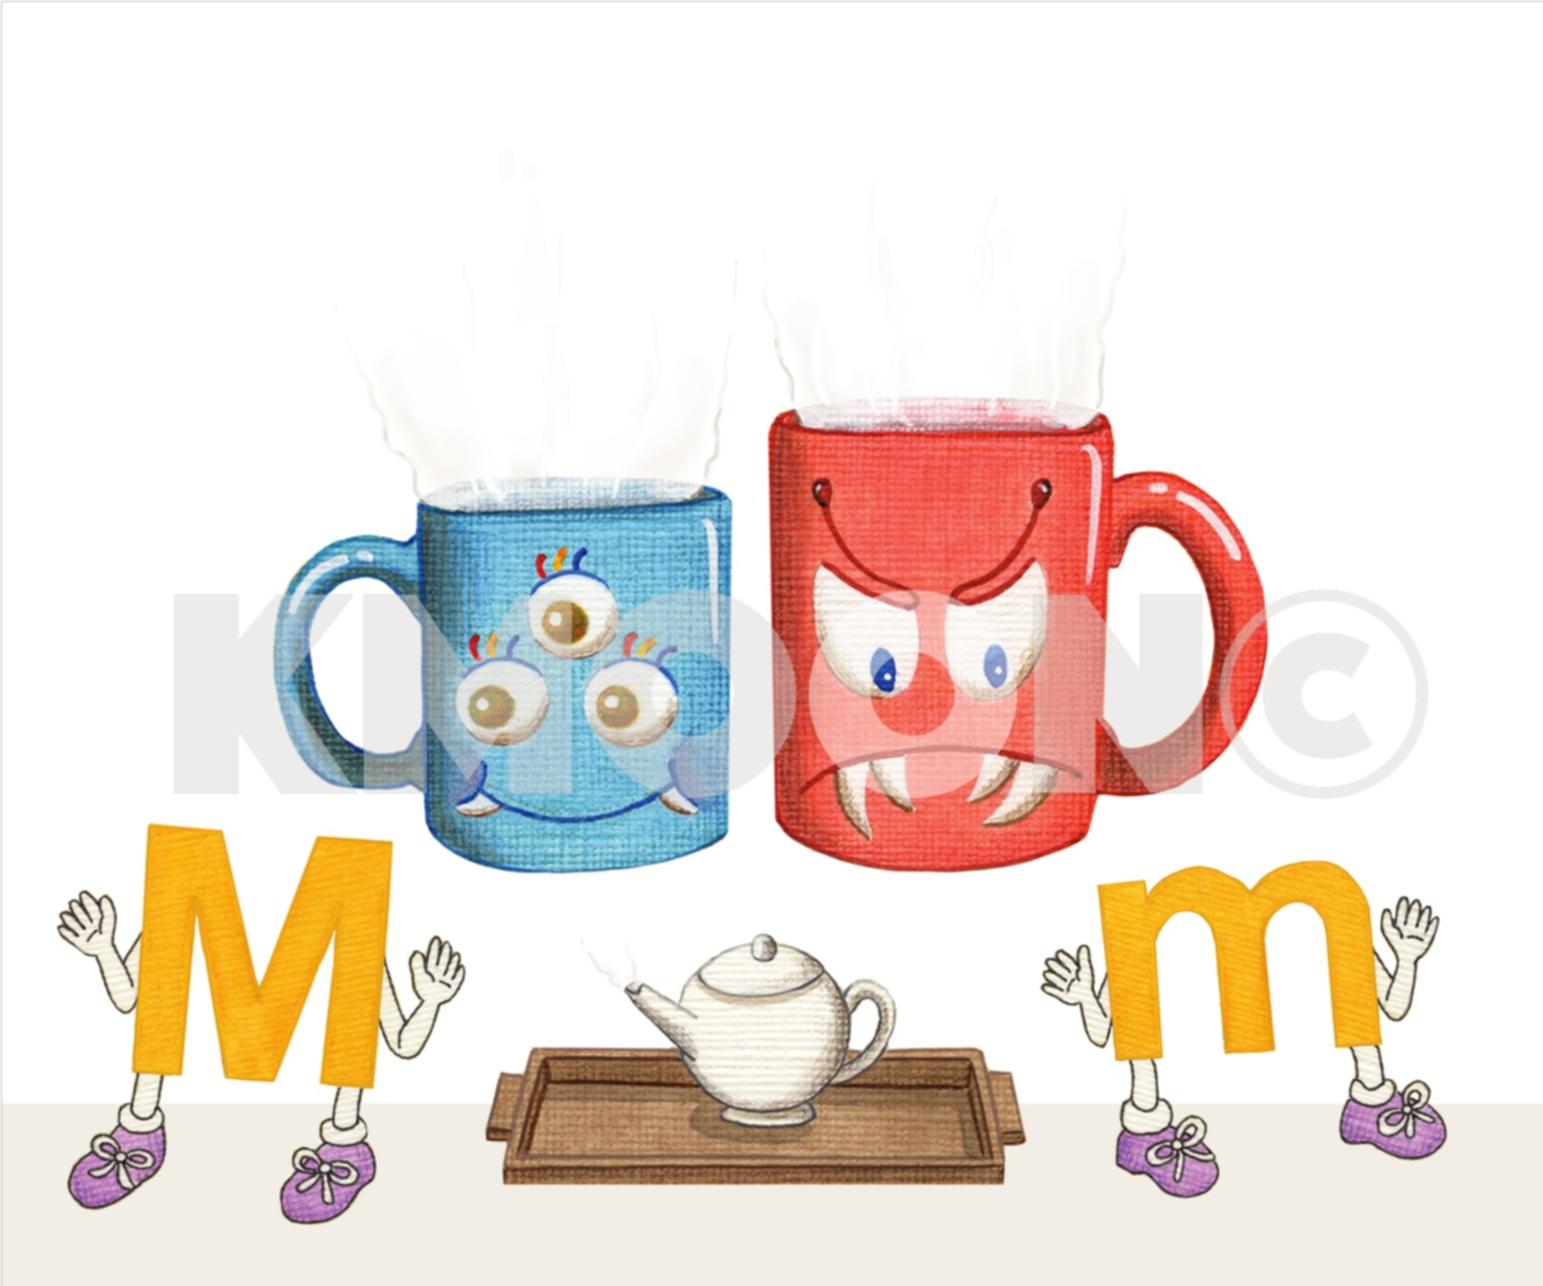 Mm is for ... mug